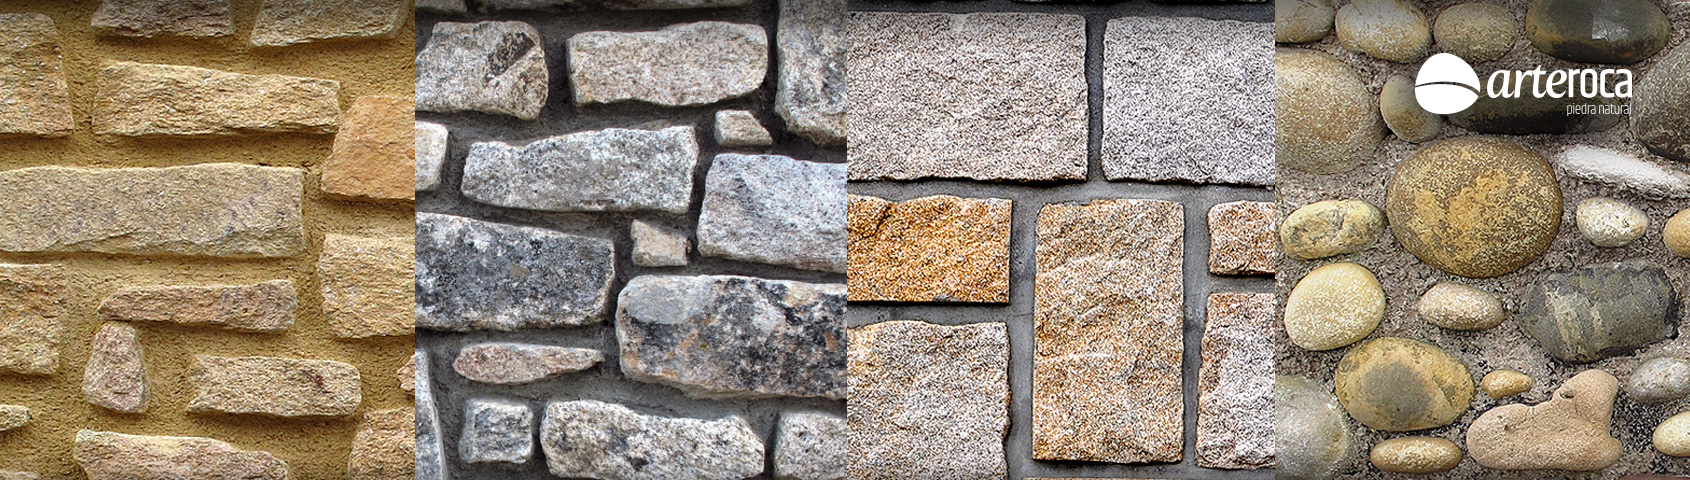 Muros arteroca - Tipos de muros de piedra ...